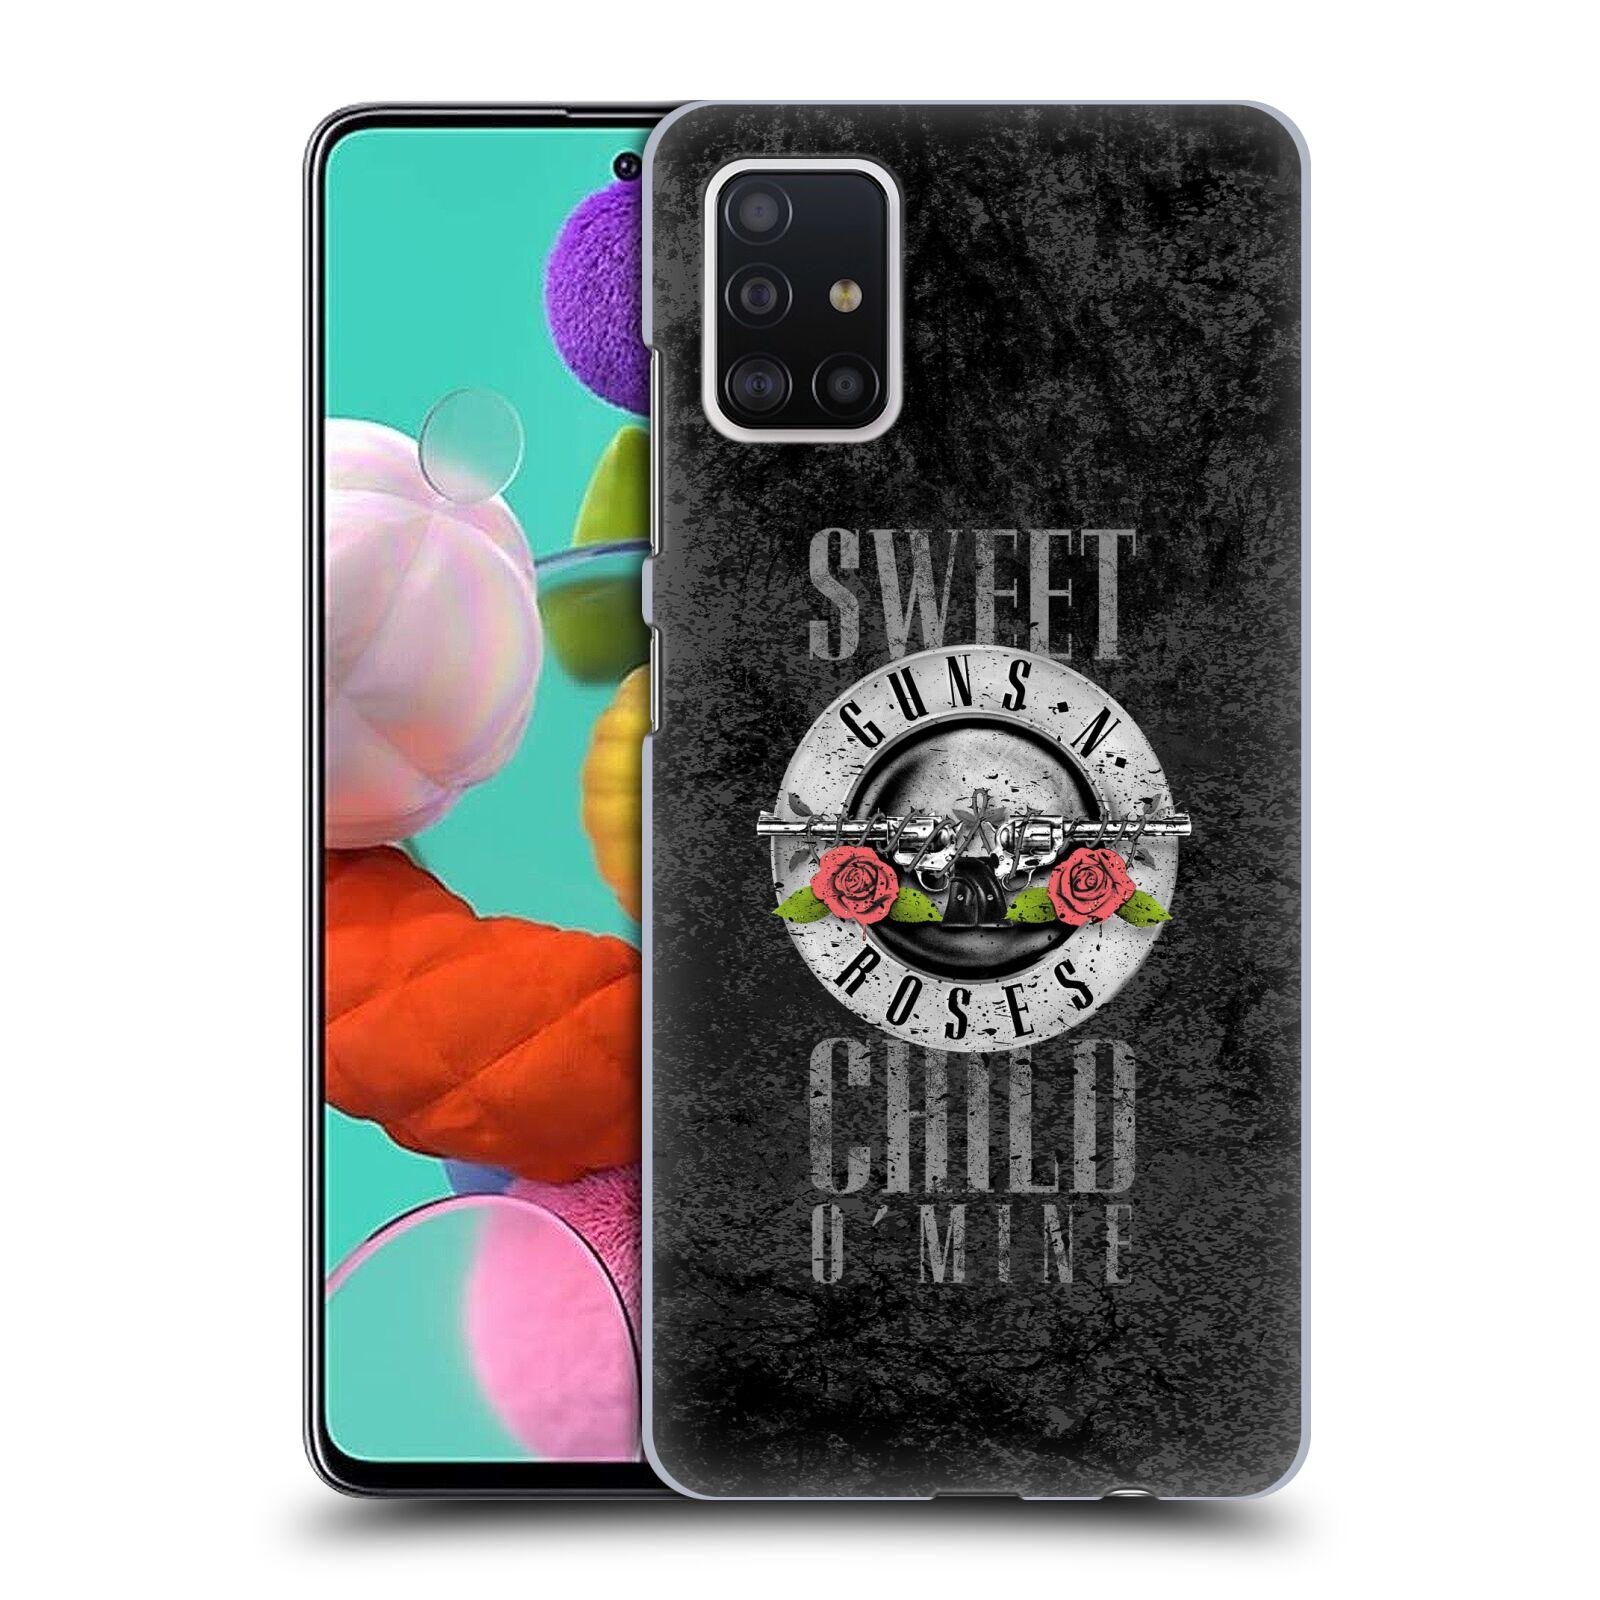 Plastové pouzdro na mobil Samsung Galaxy A51 - Head Case - Guns N' Roses - Sweet Child